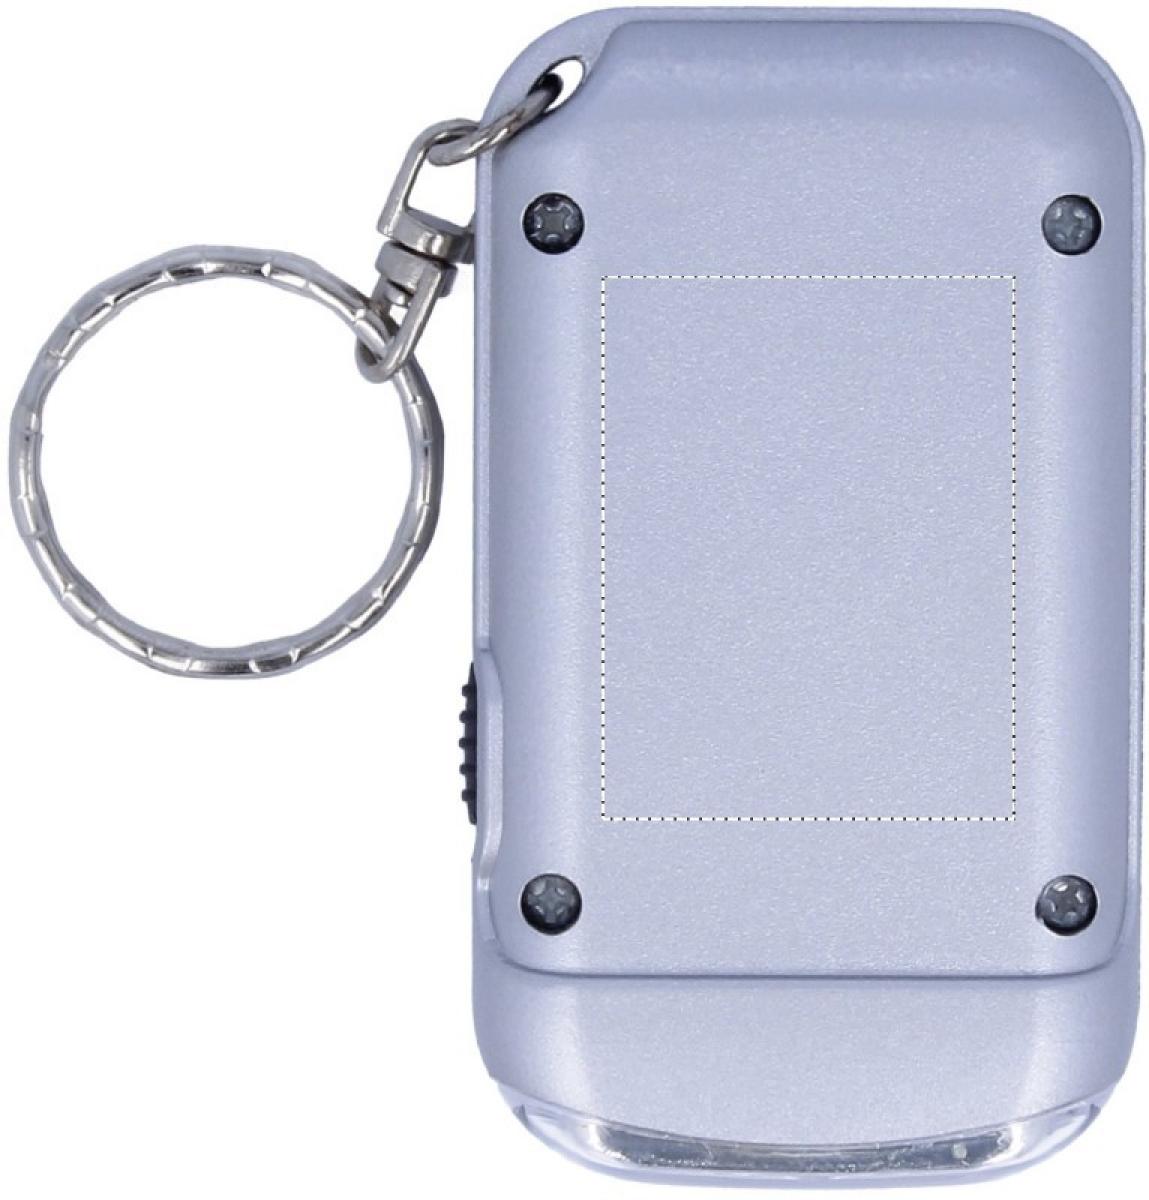 Zilveren sleutelhanger met zaklamp - Back